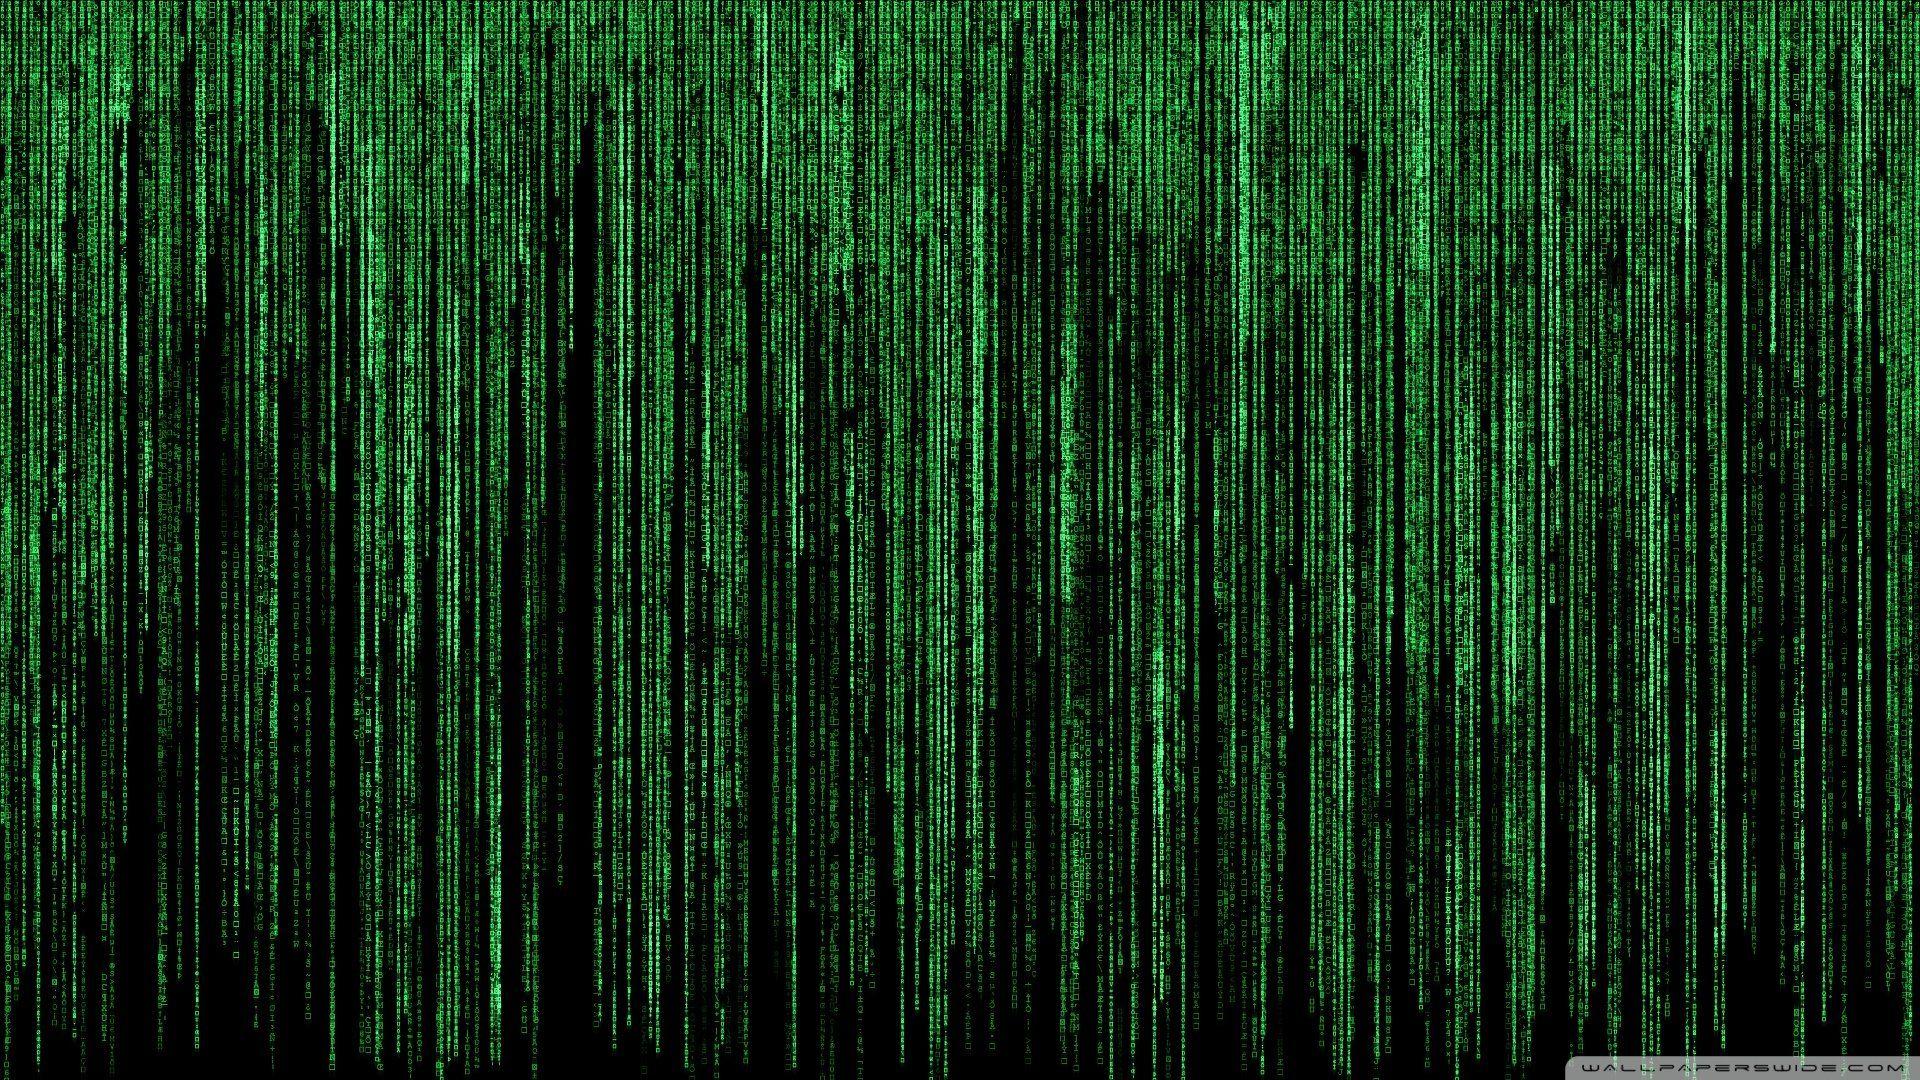 5760x1080 Matrix Wallpapers On Wallpaperdog